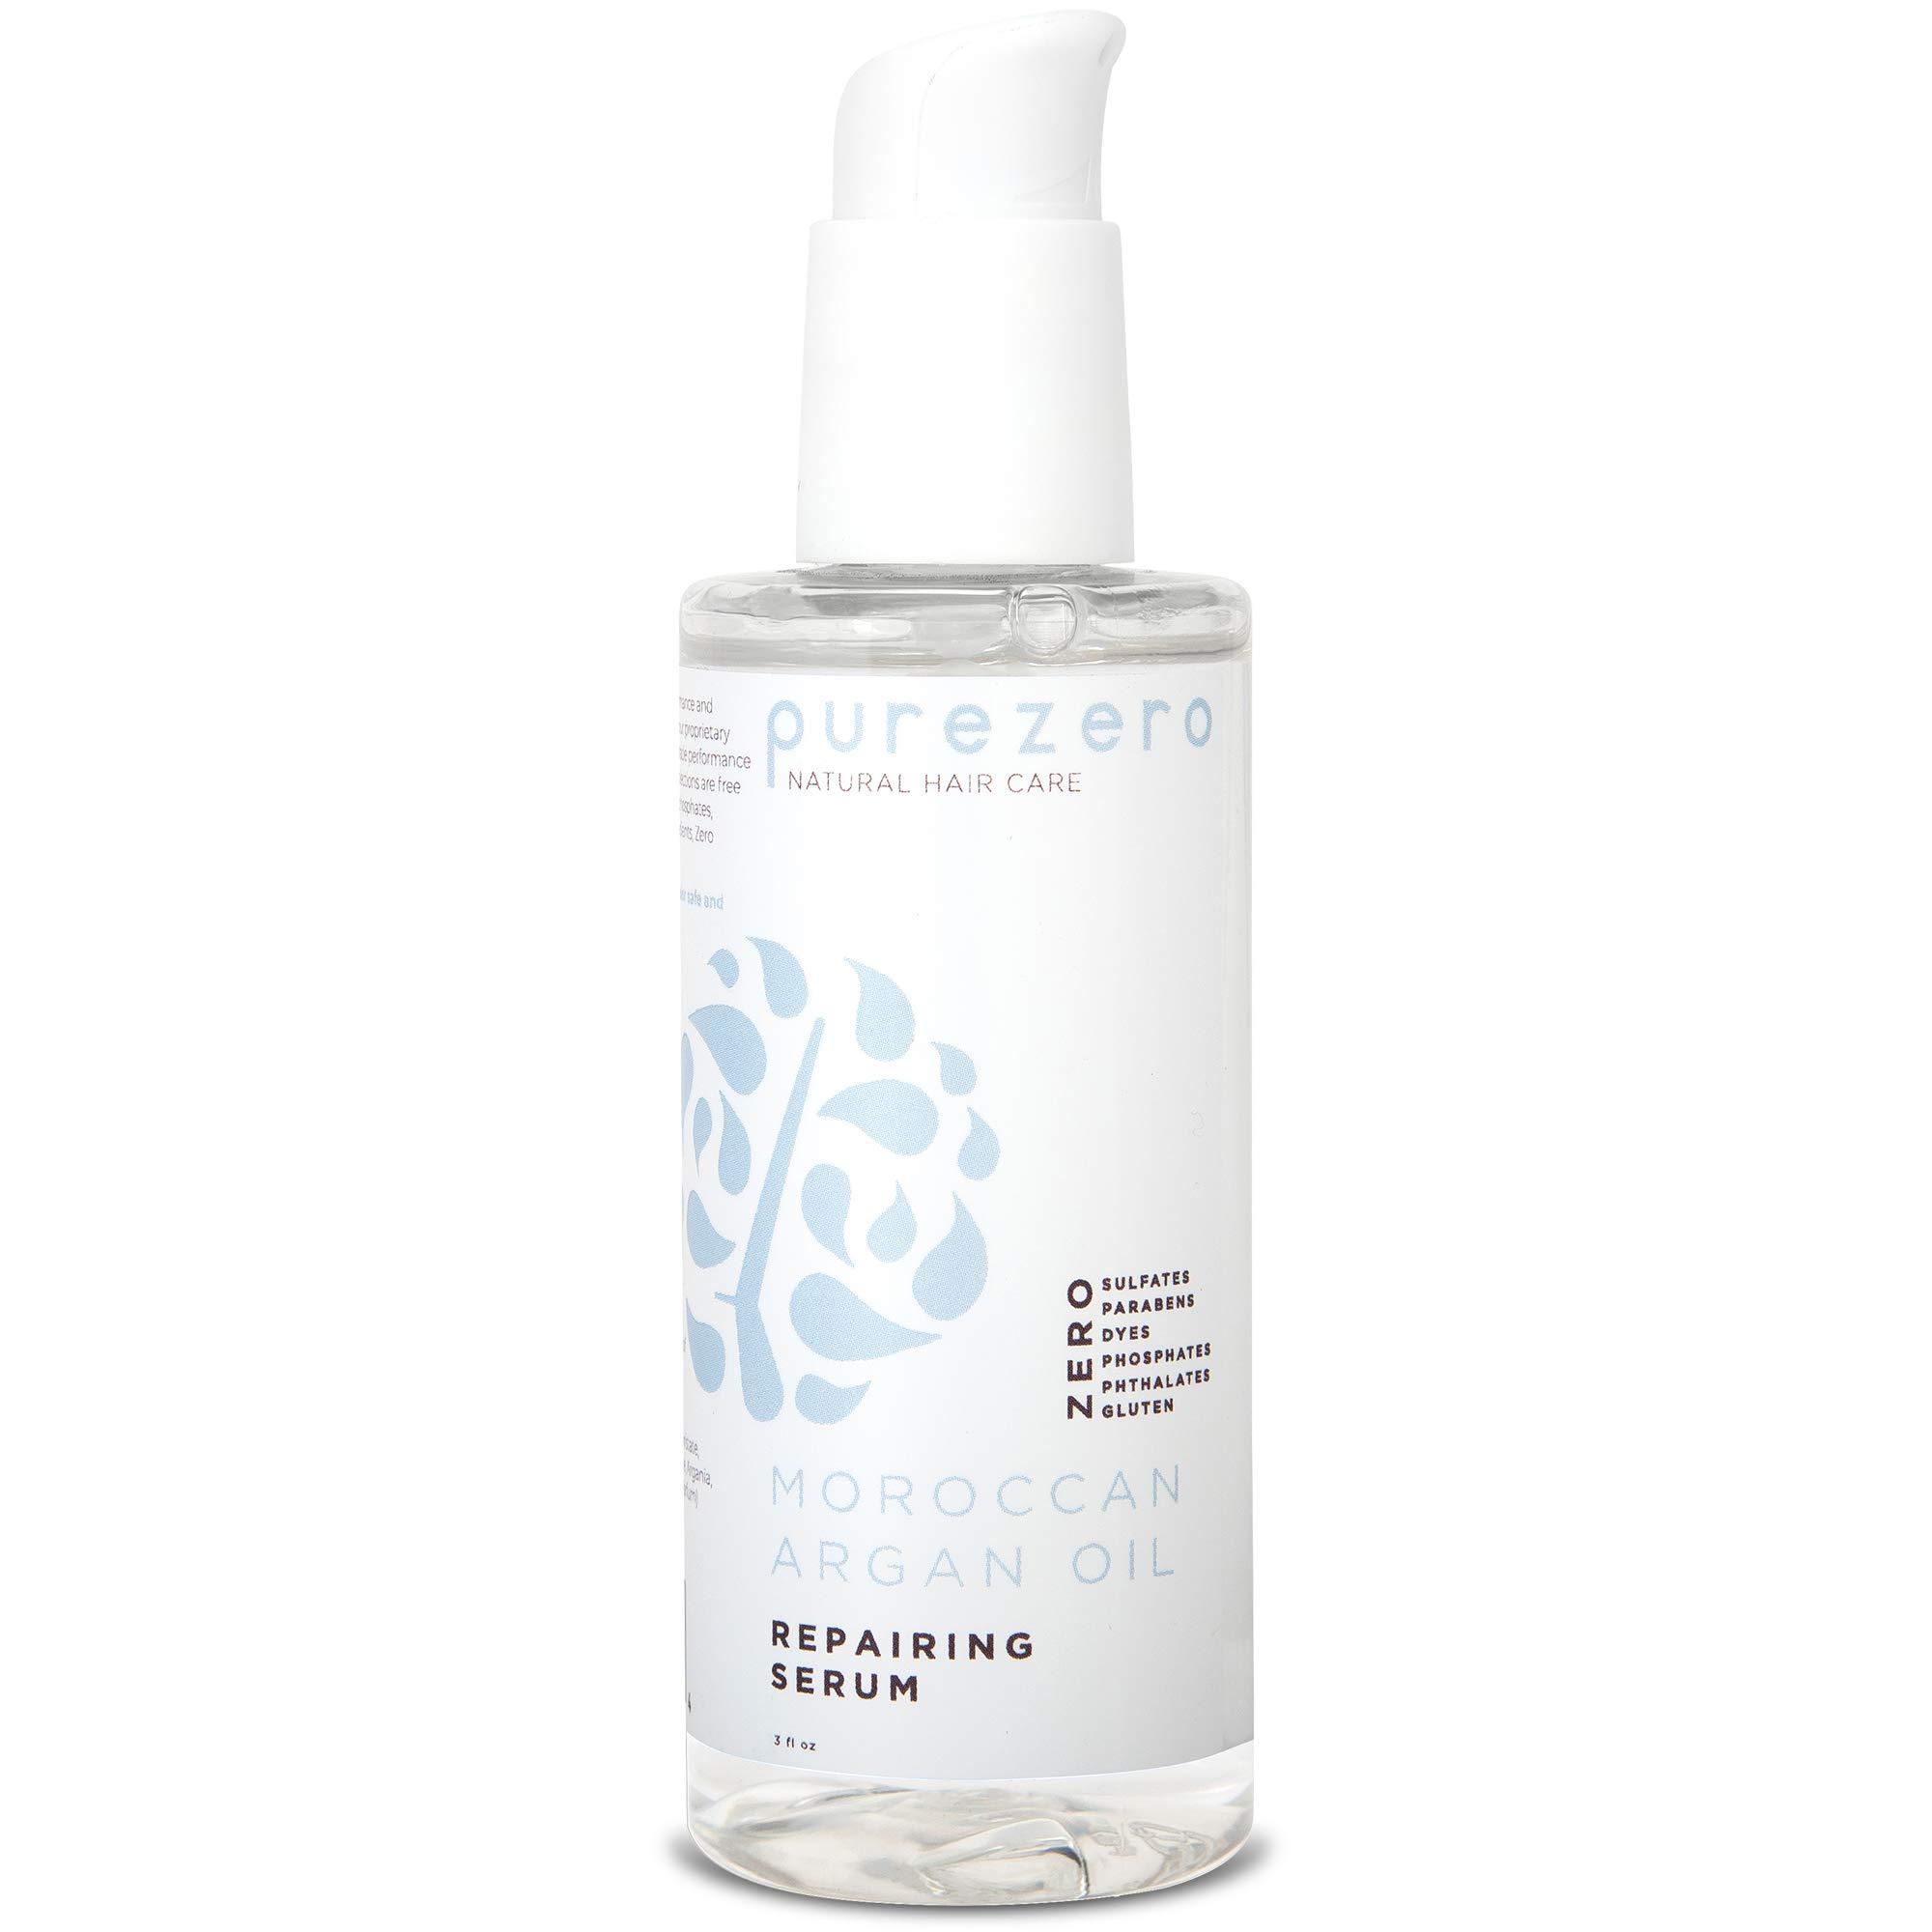 Purezero Moroccan Argan Oil Repairing Serum - Repair Dry, Damaged Hair - Increase Hydration & Shine - Zero Sulfates, Parabens, Dyes, Gluten - 100% Vegan & Cruelty Free - Great For Color Treated Hair